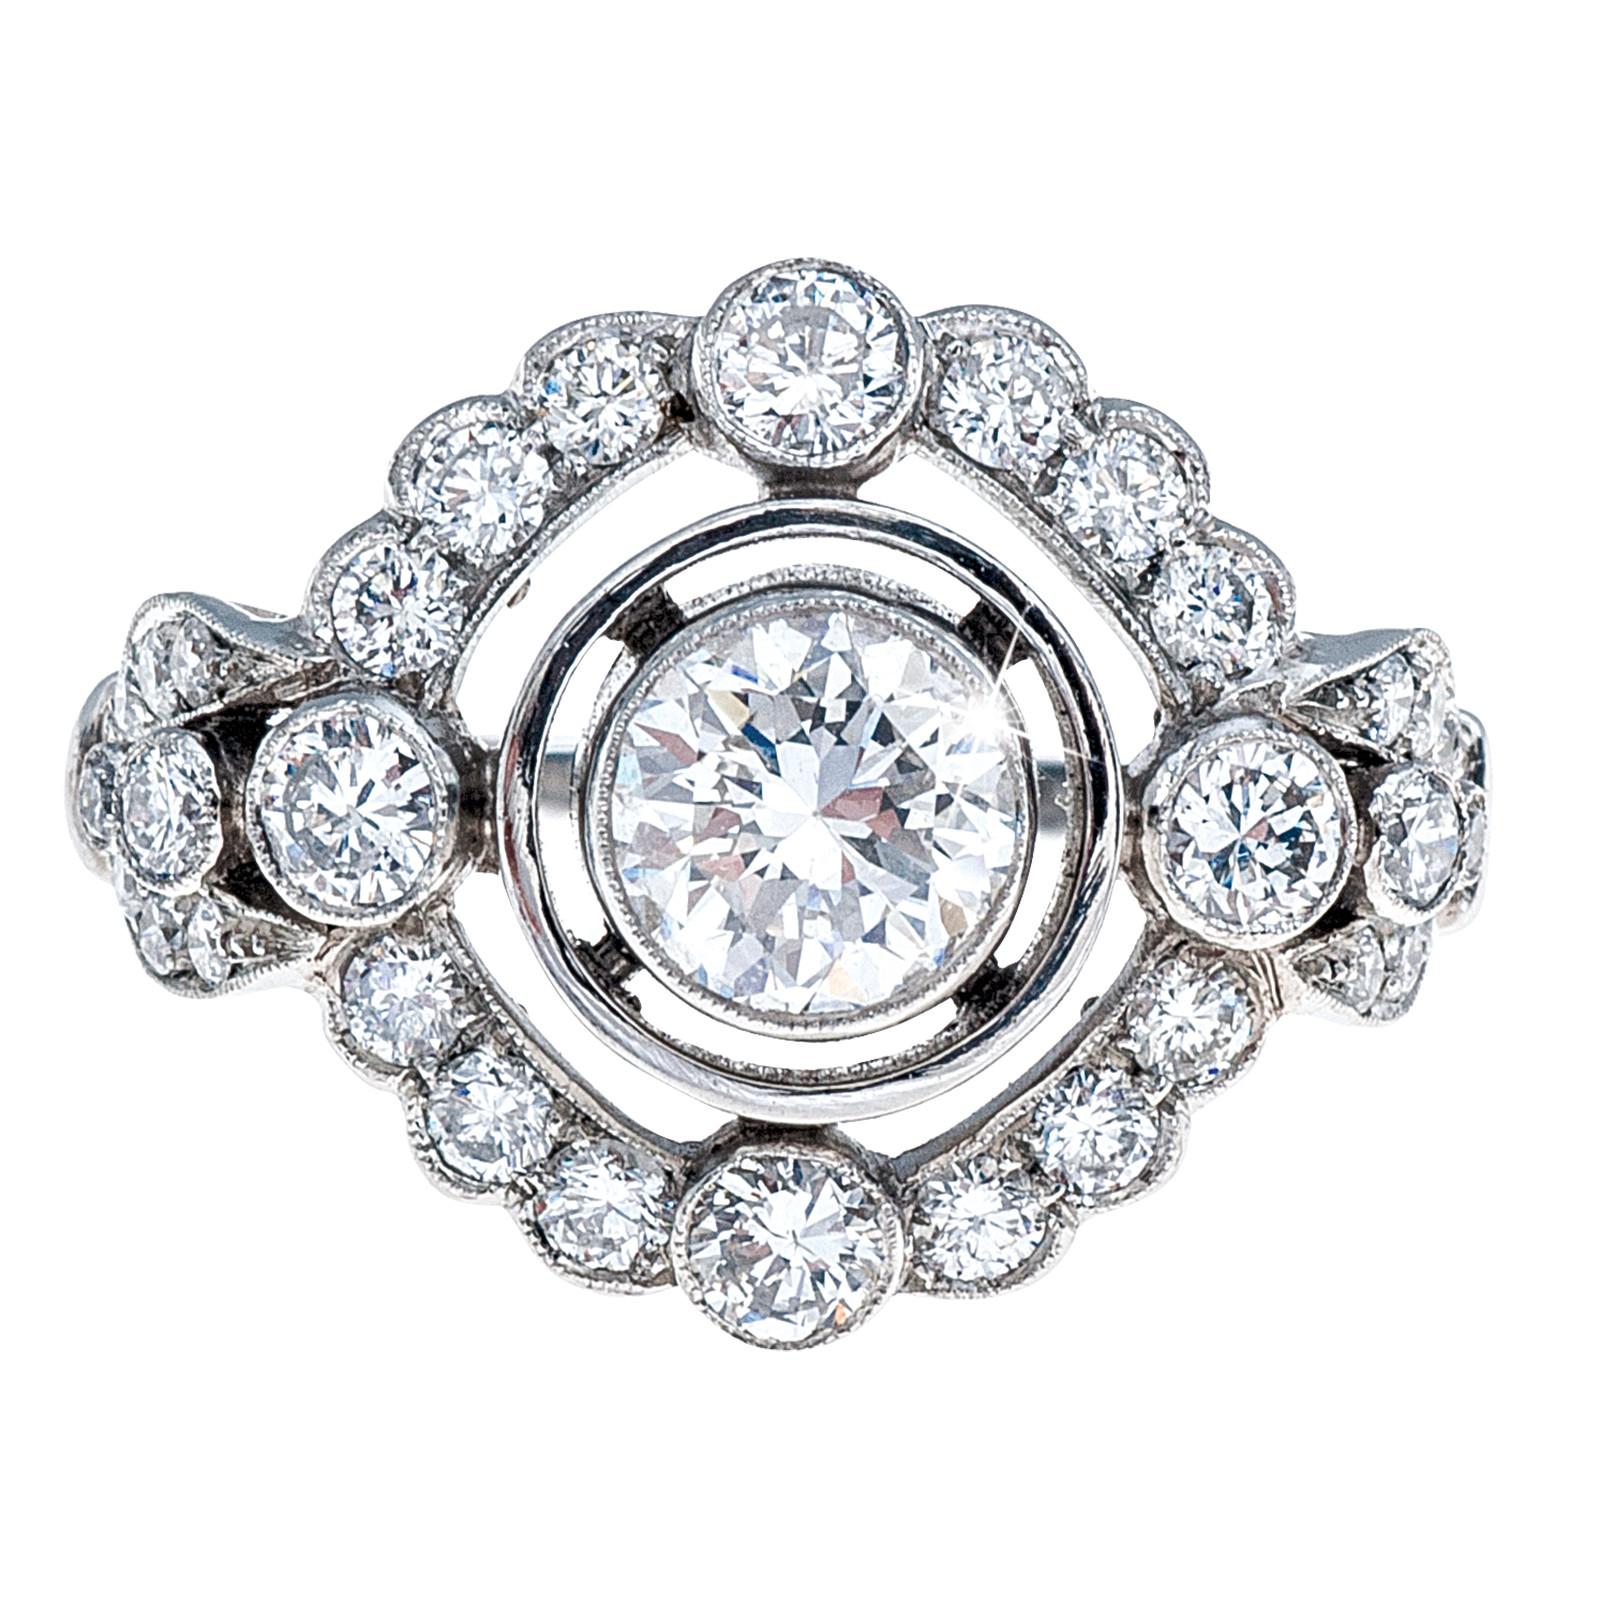 New Art Deco Inspired 1.54 ctw Diamond Halo Engagement Ring